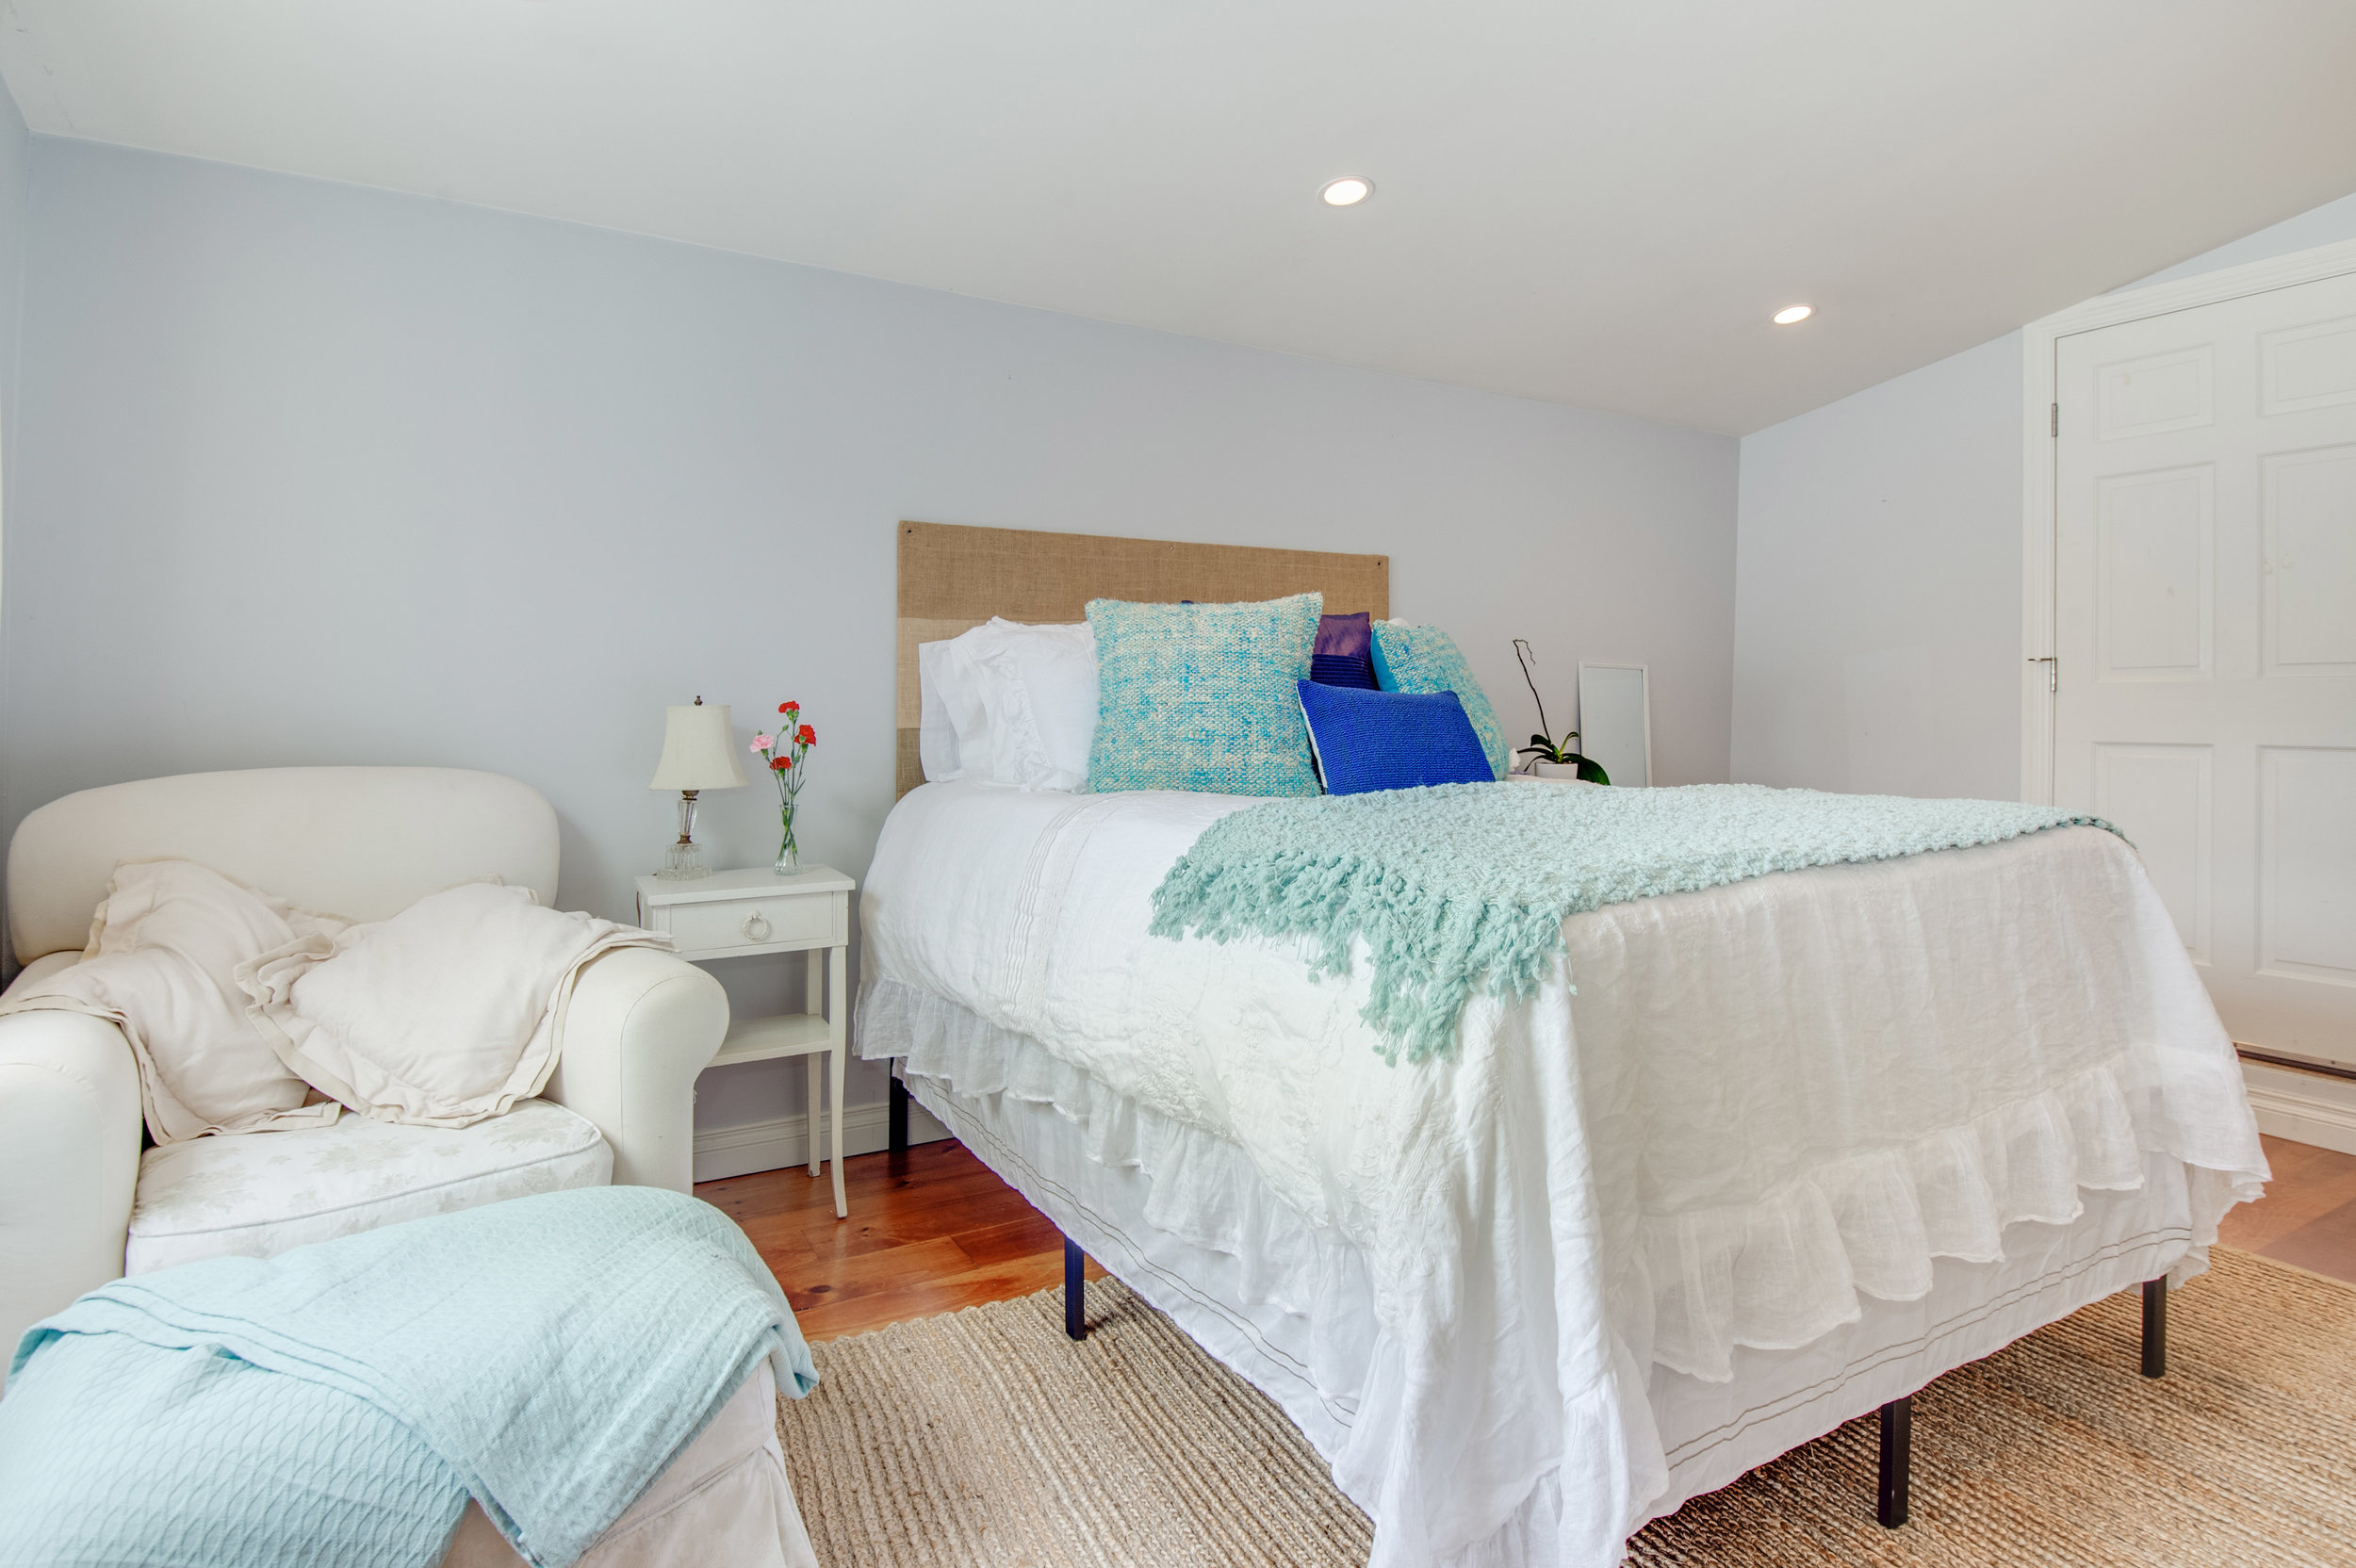 008 Bedroom 3950 Las Flores For Sale Lease The Malibu Life Team Luxury Real Estate.jpg